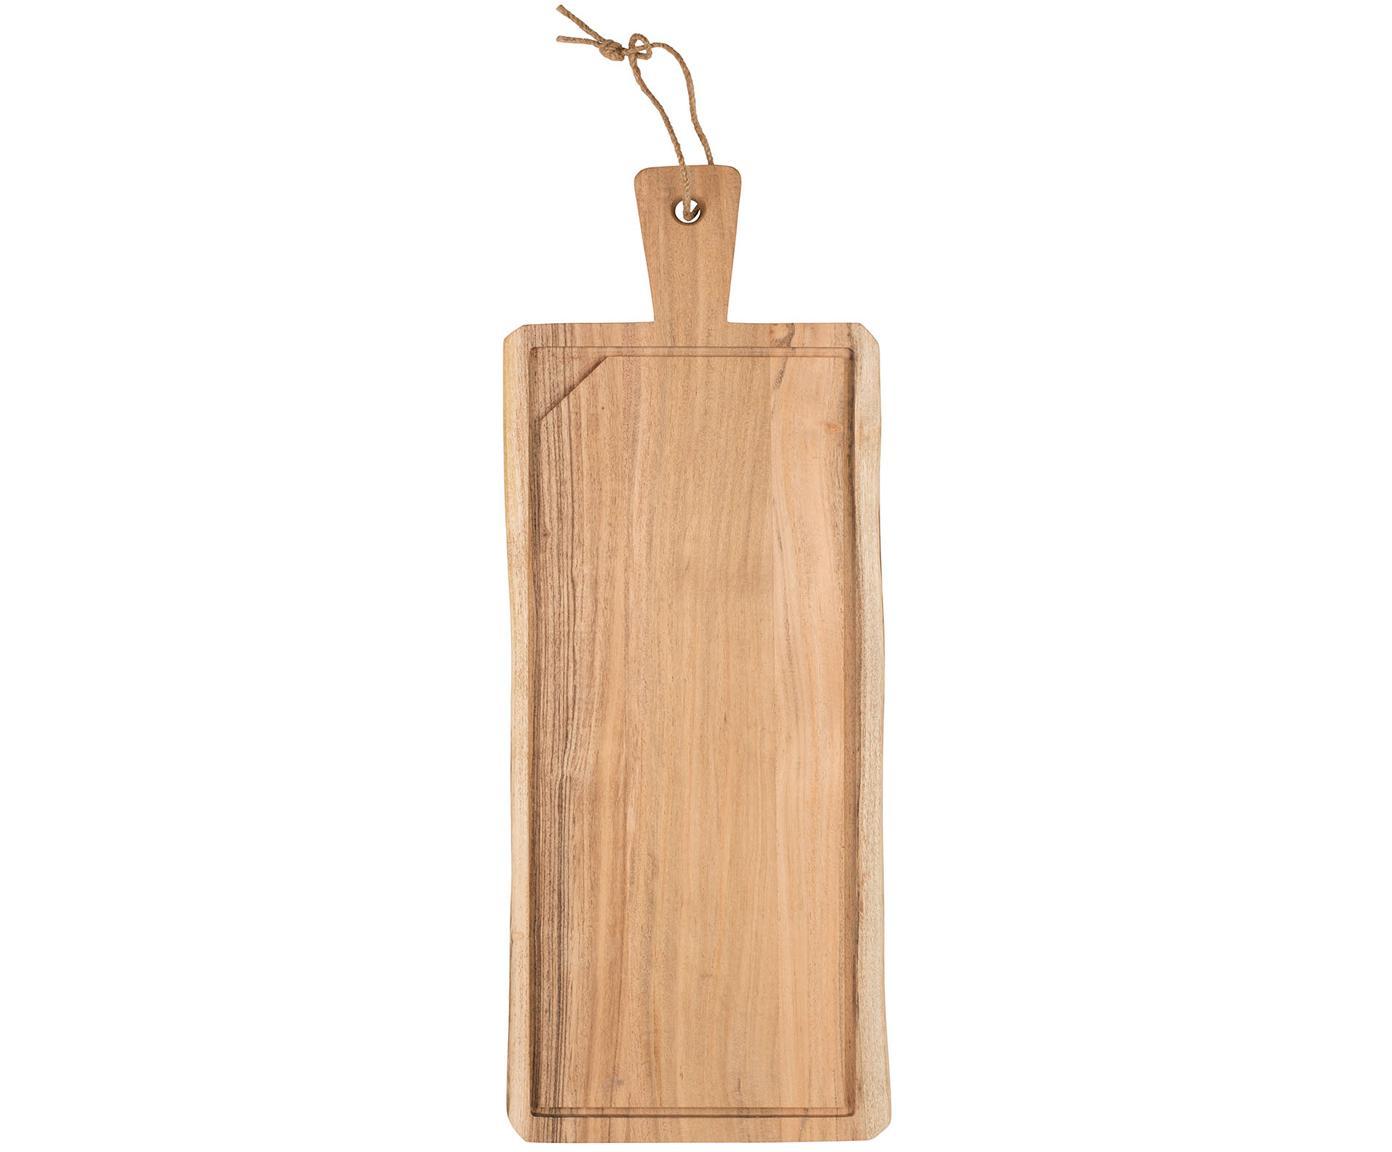 Snijplank Albert, Acaciahout, Acaciahoutkleurig, B 60 x D 23 cm